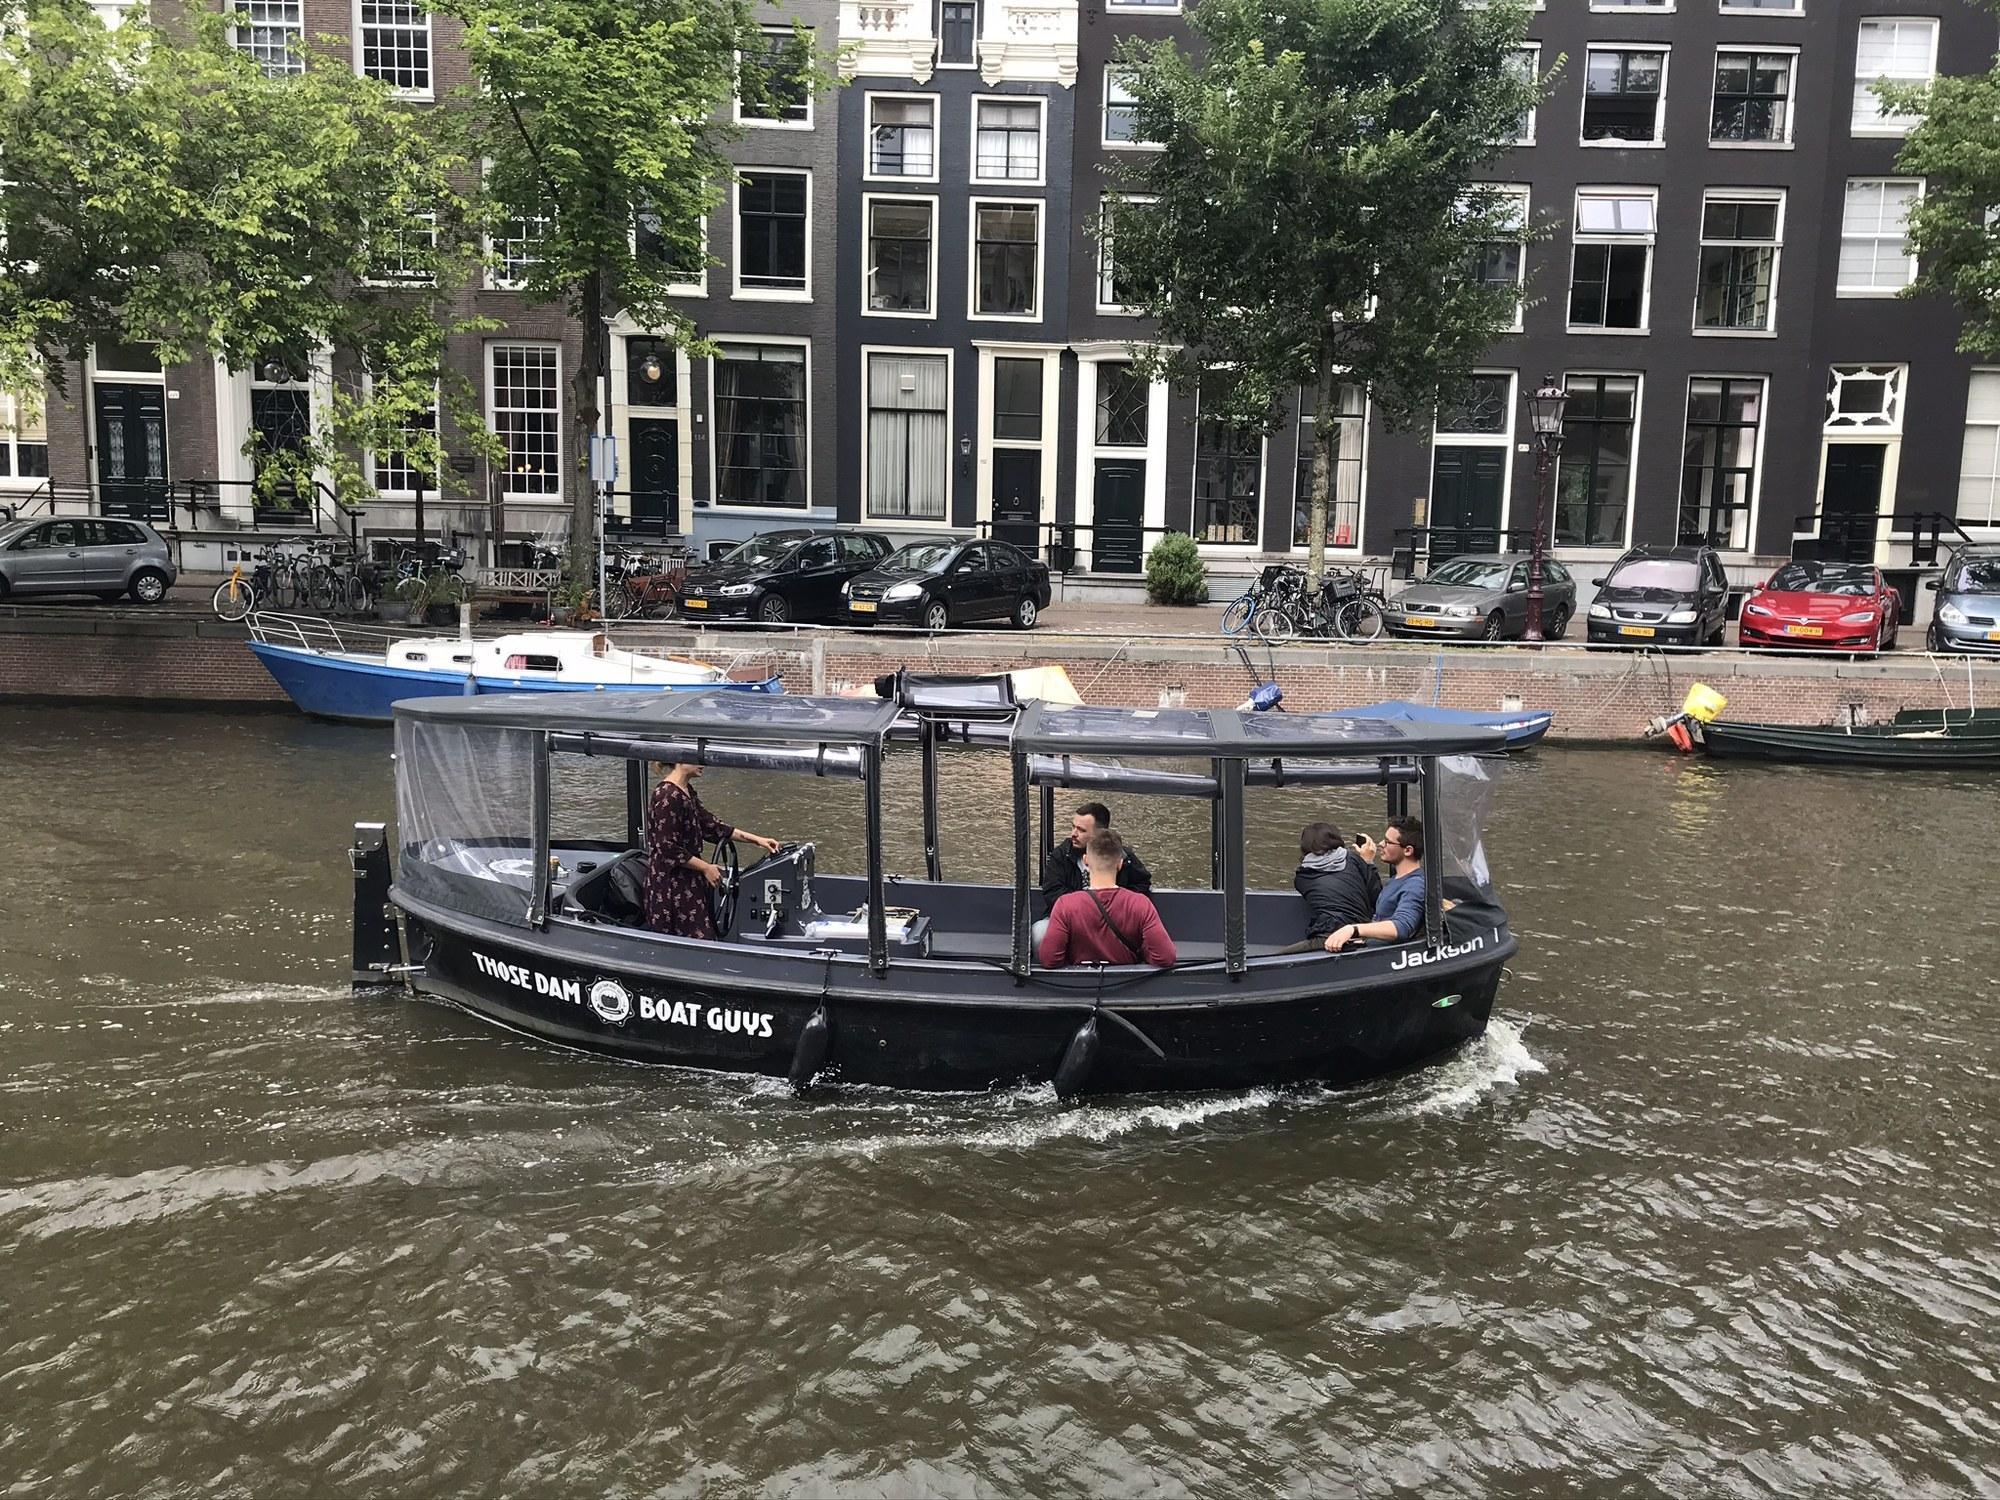 Sky of Amsterdam